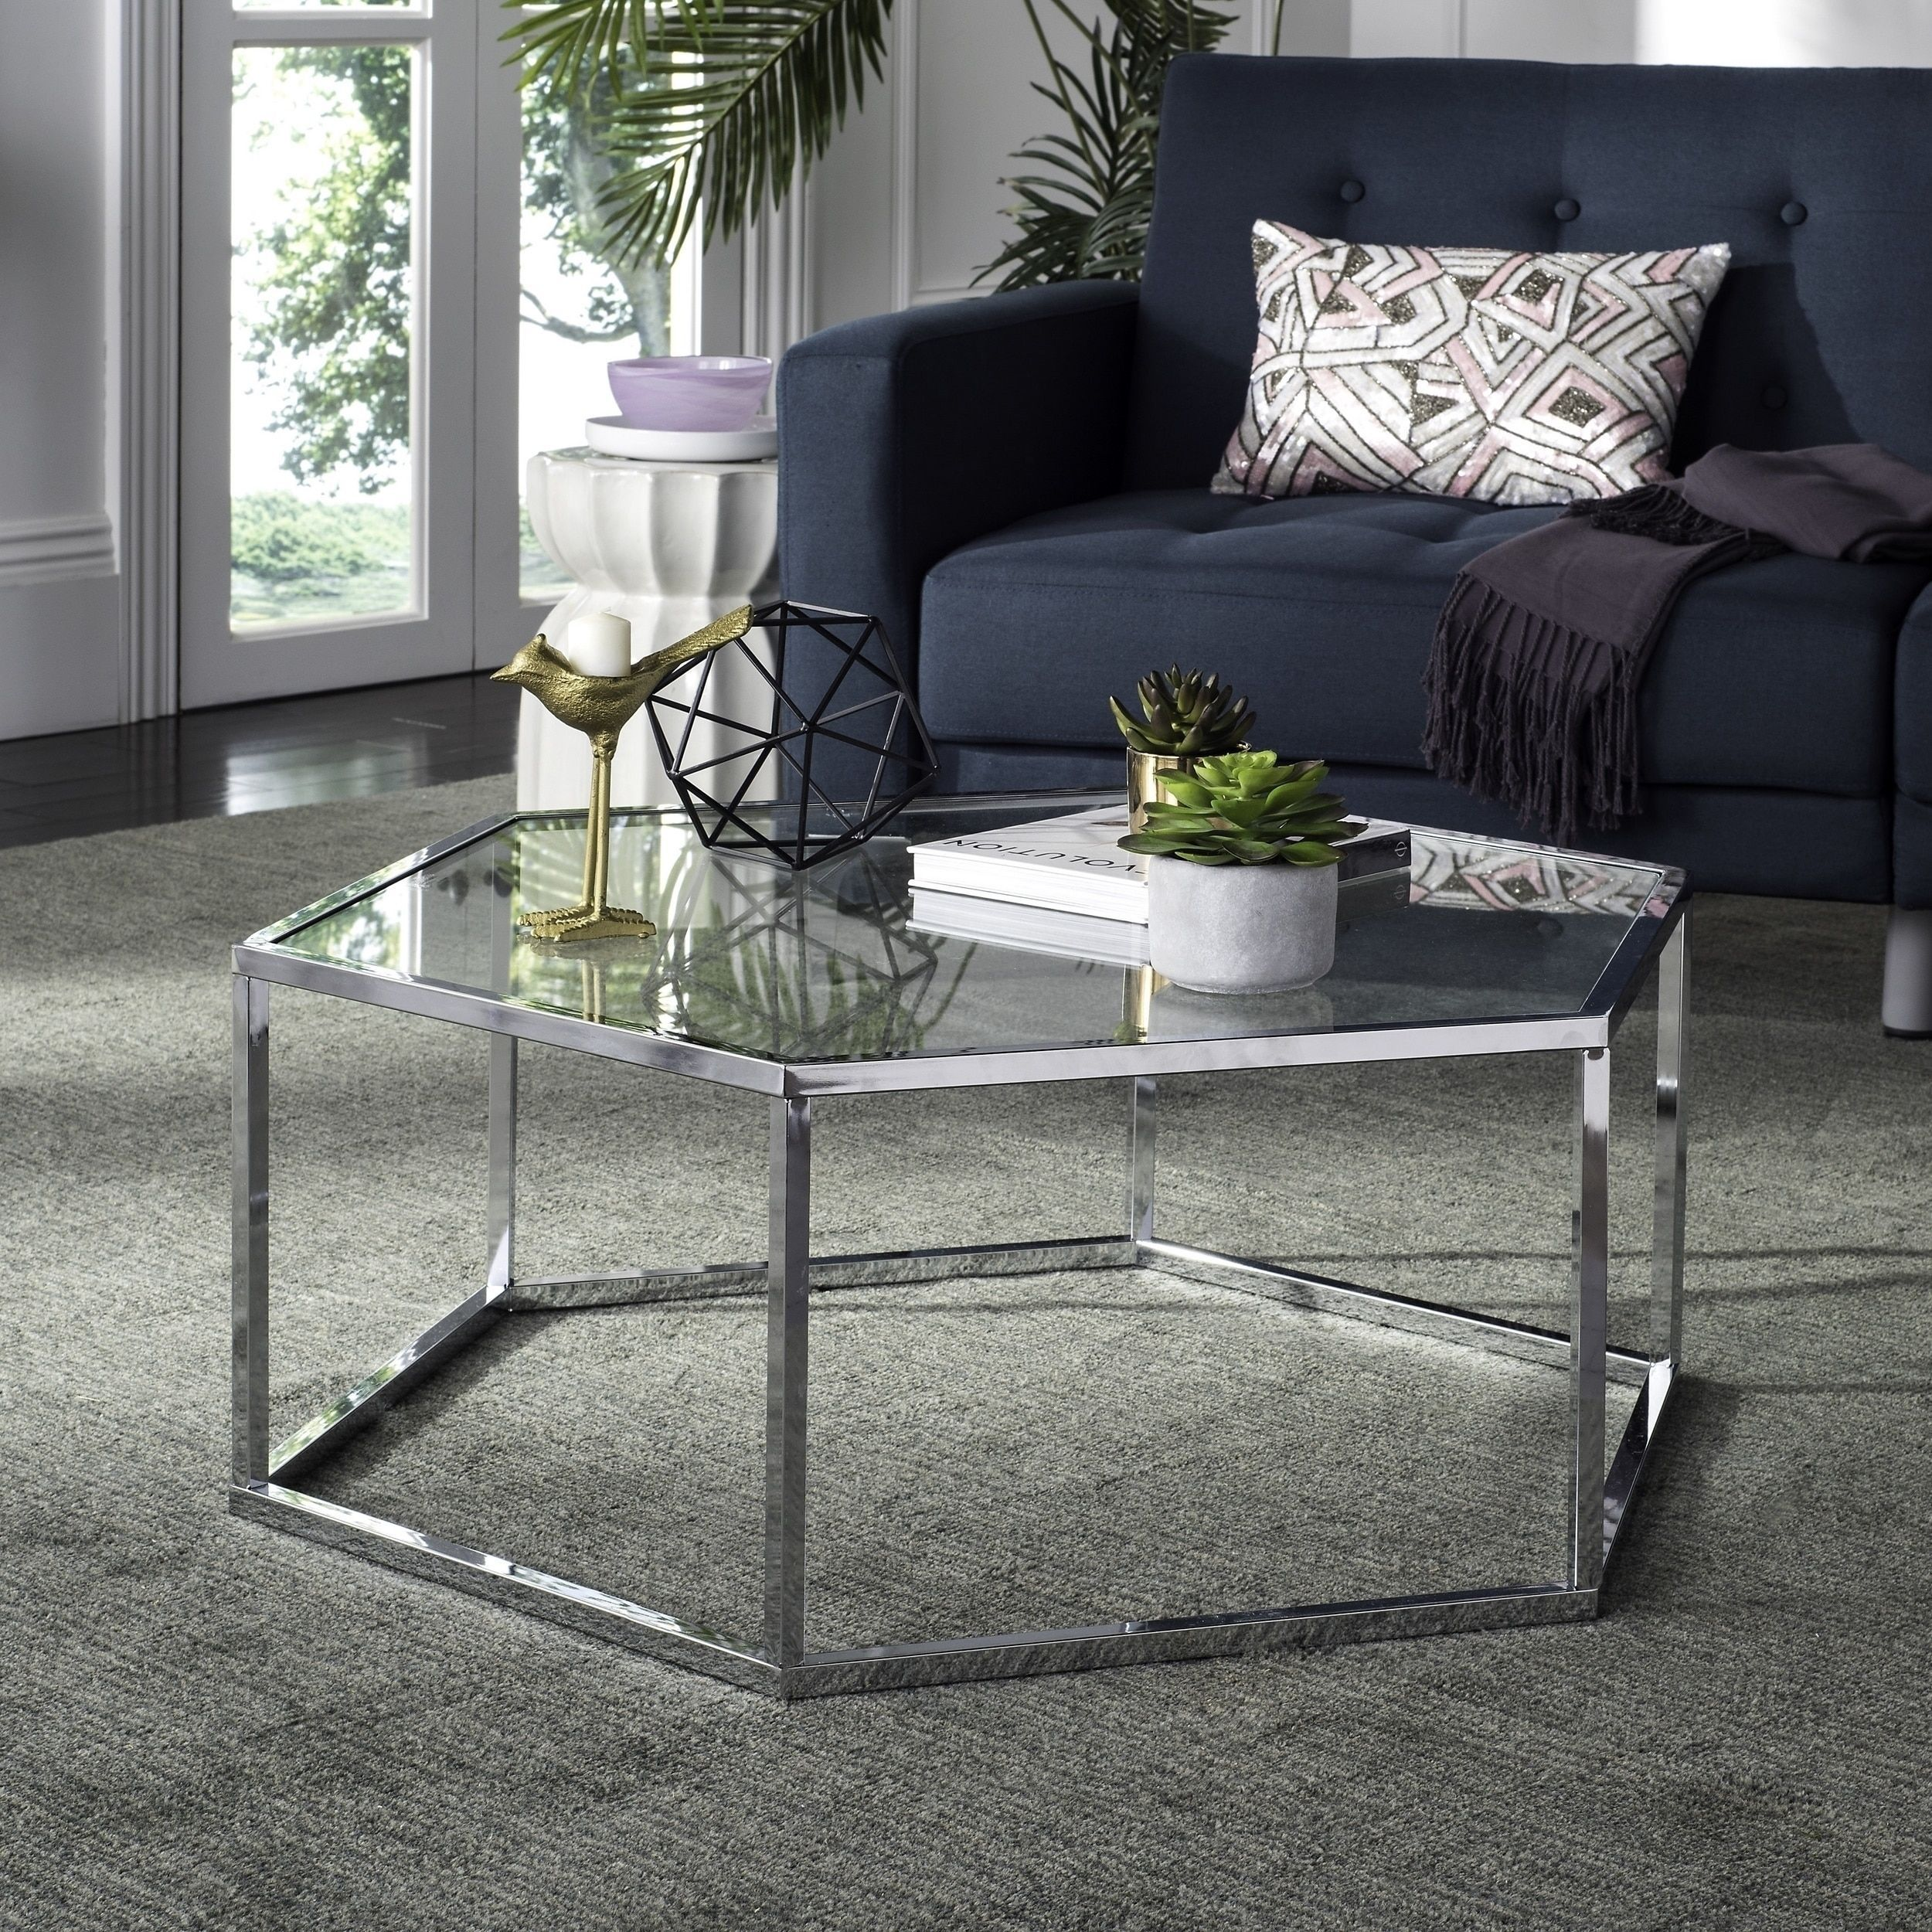 Our Best Living Room Furniture Deals Hexagon Coffee Table Coffee Table Furniture [ jpg ]